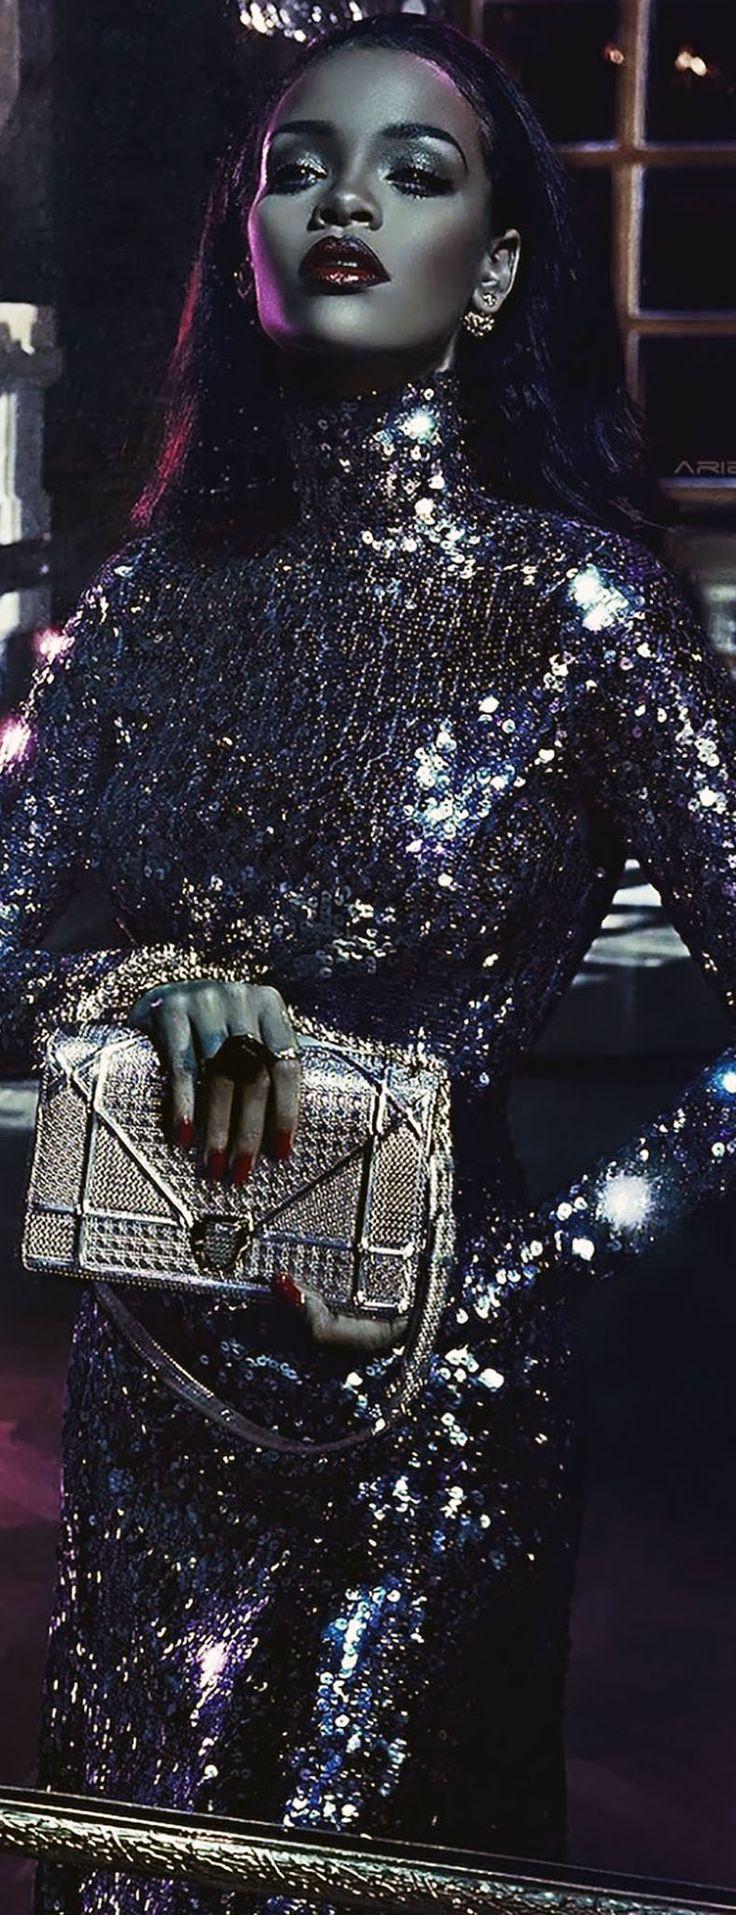 Dior Secret Garden 2015 Campaign featuring Rihanna photographed by Steven Klein | justjune